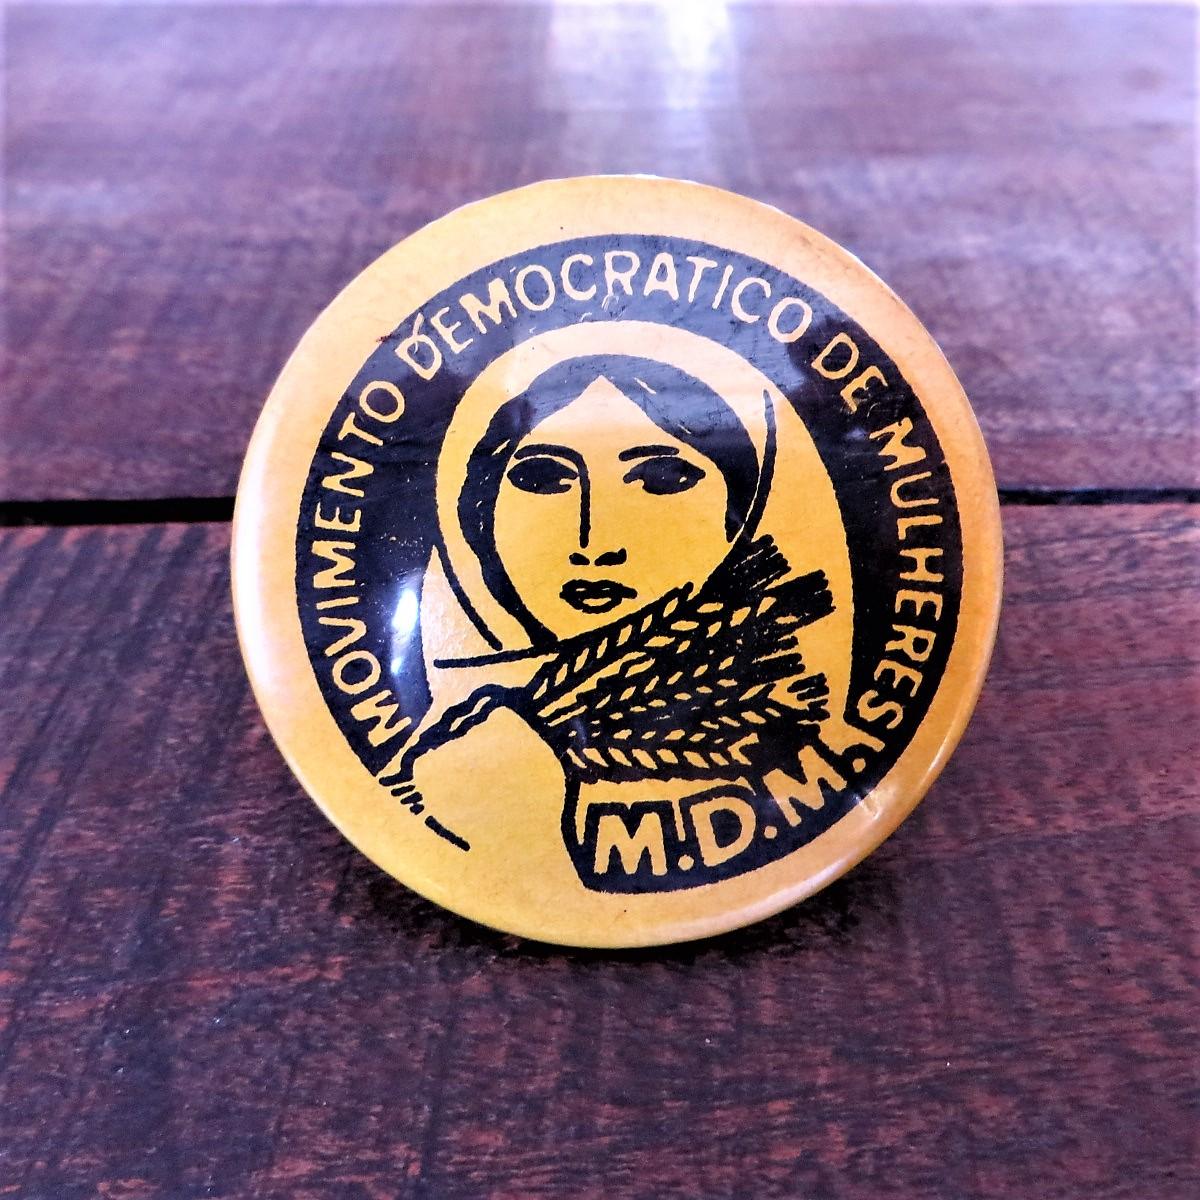 button-movimento-democratico-de-mulheres-1